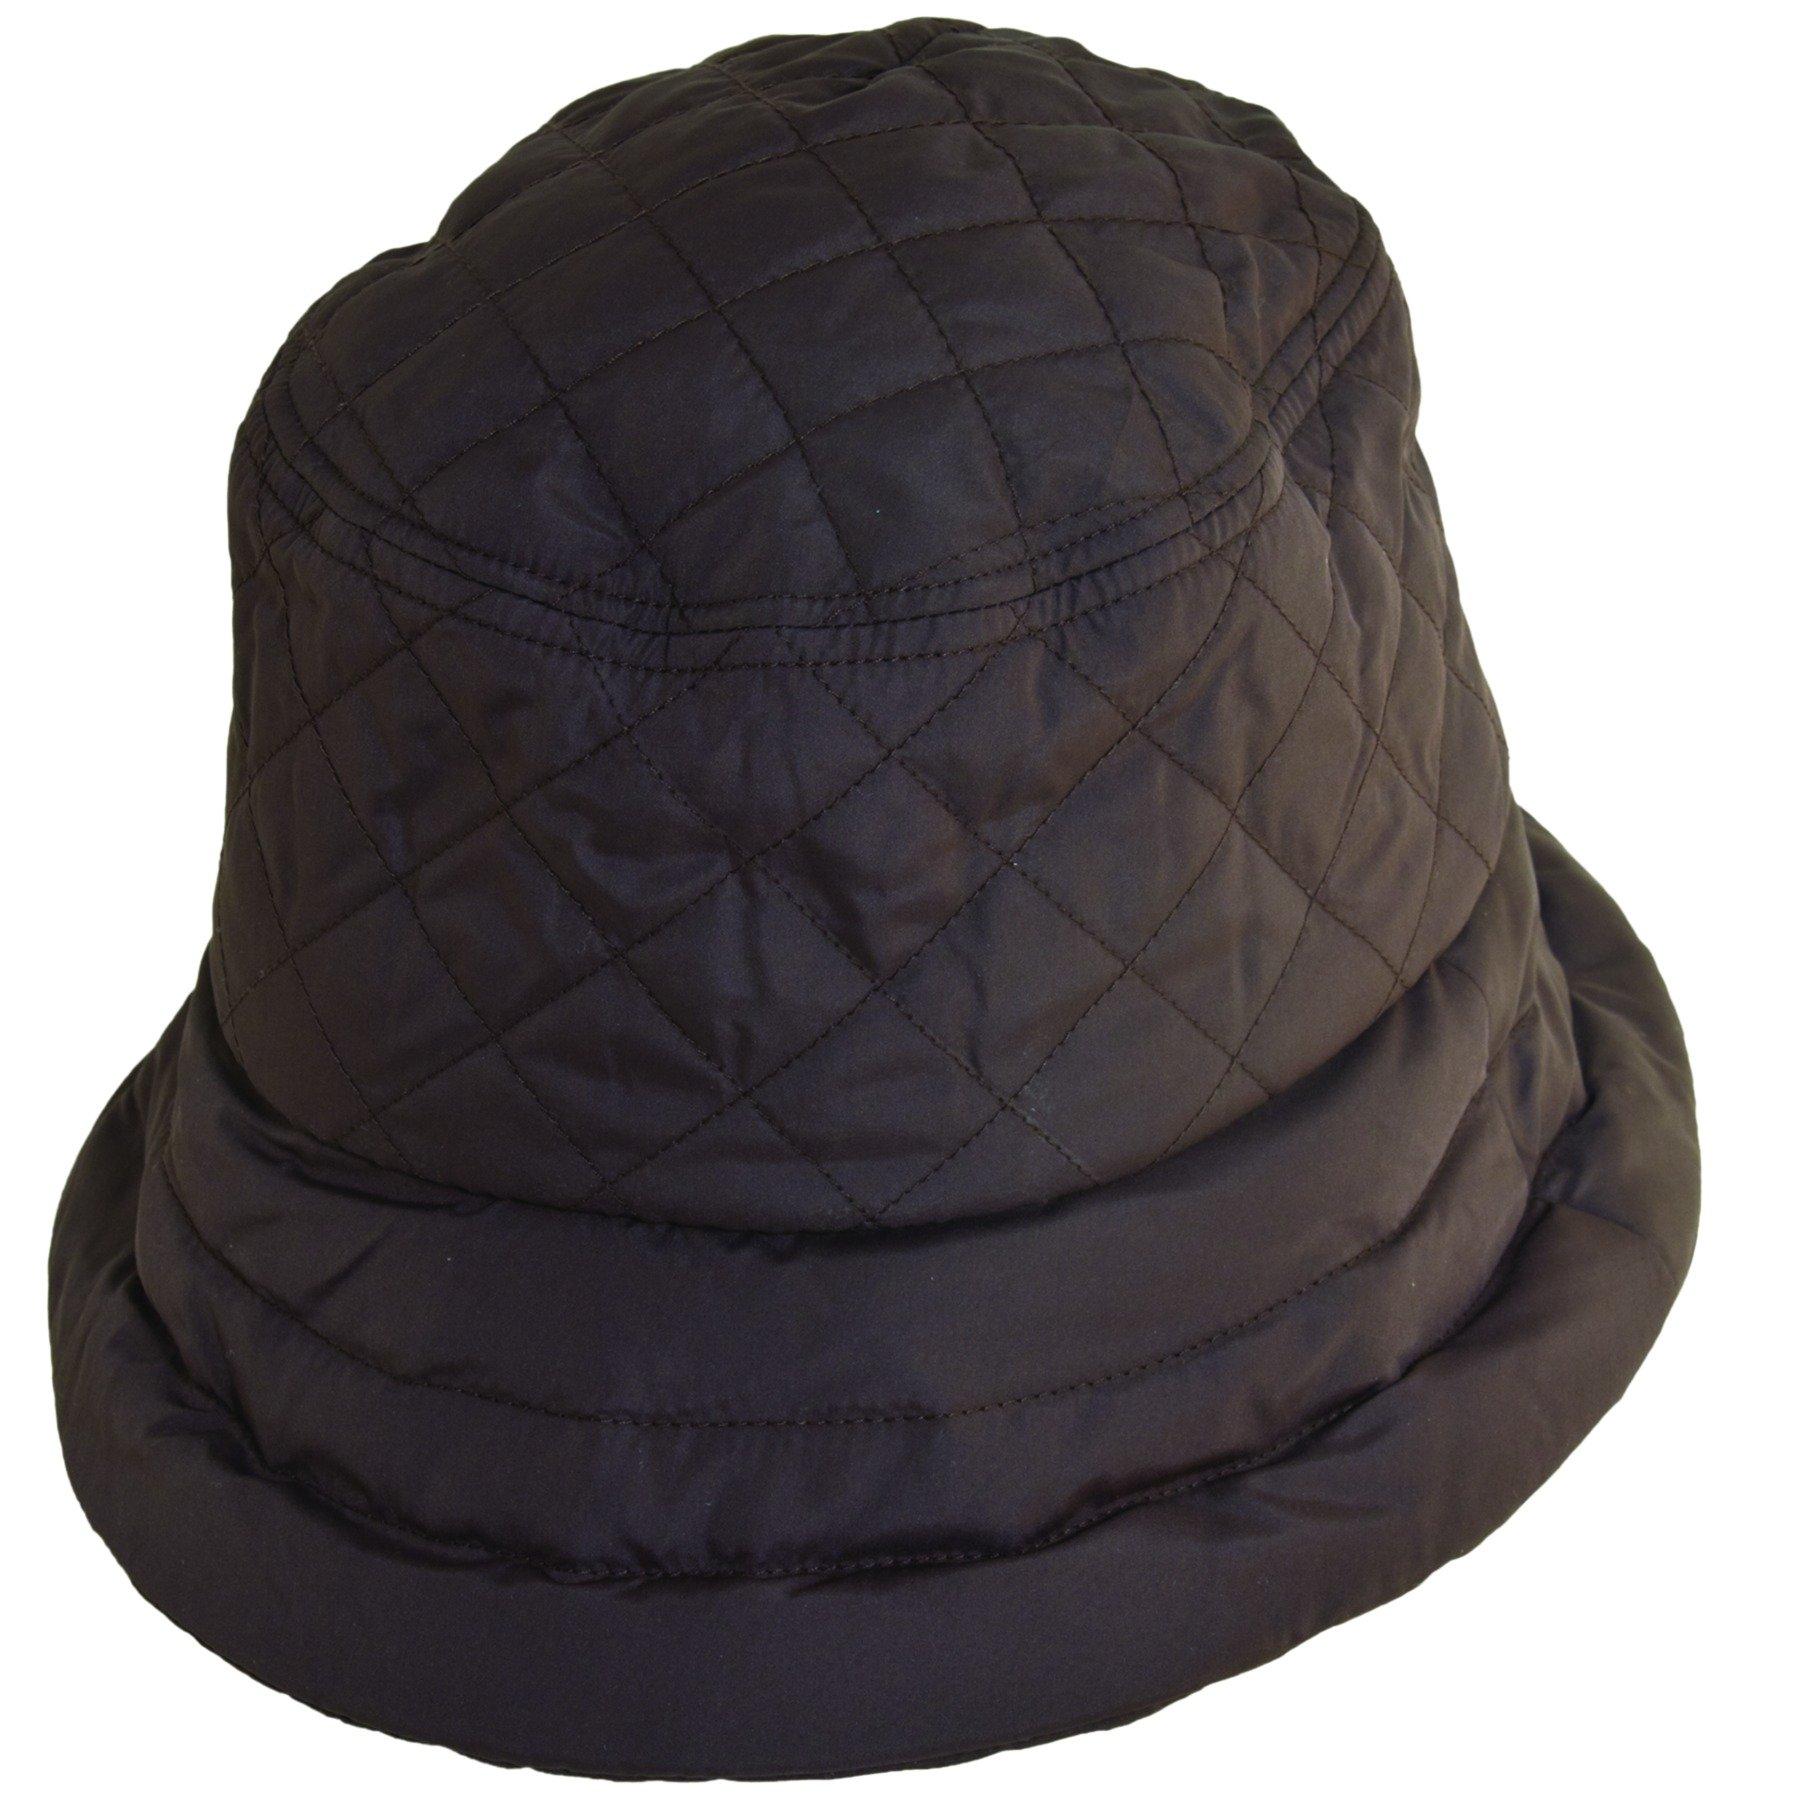 Scala Quilted Rain Bucket Hat (Chocolate)